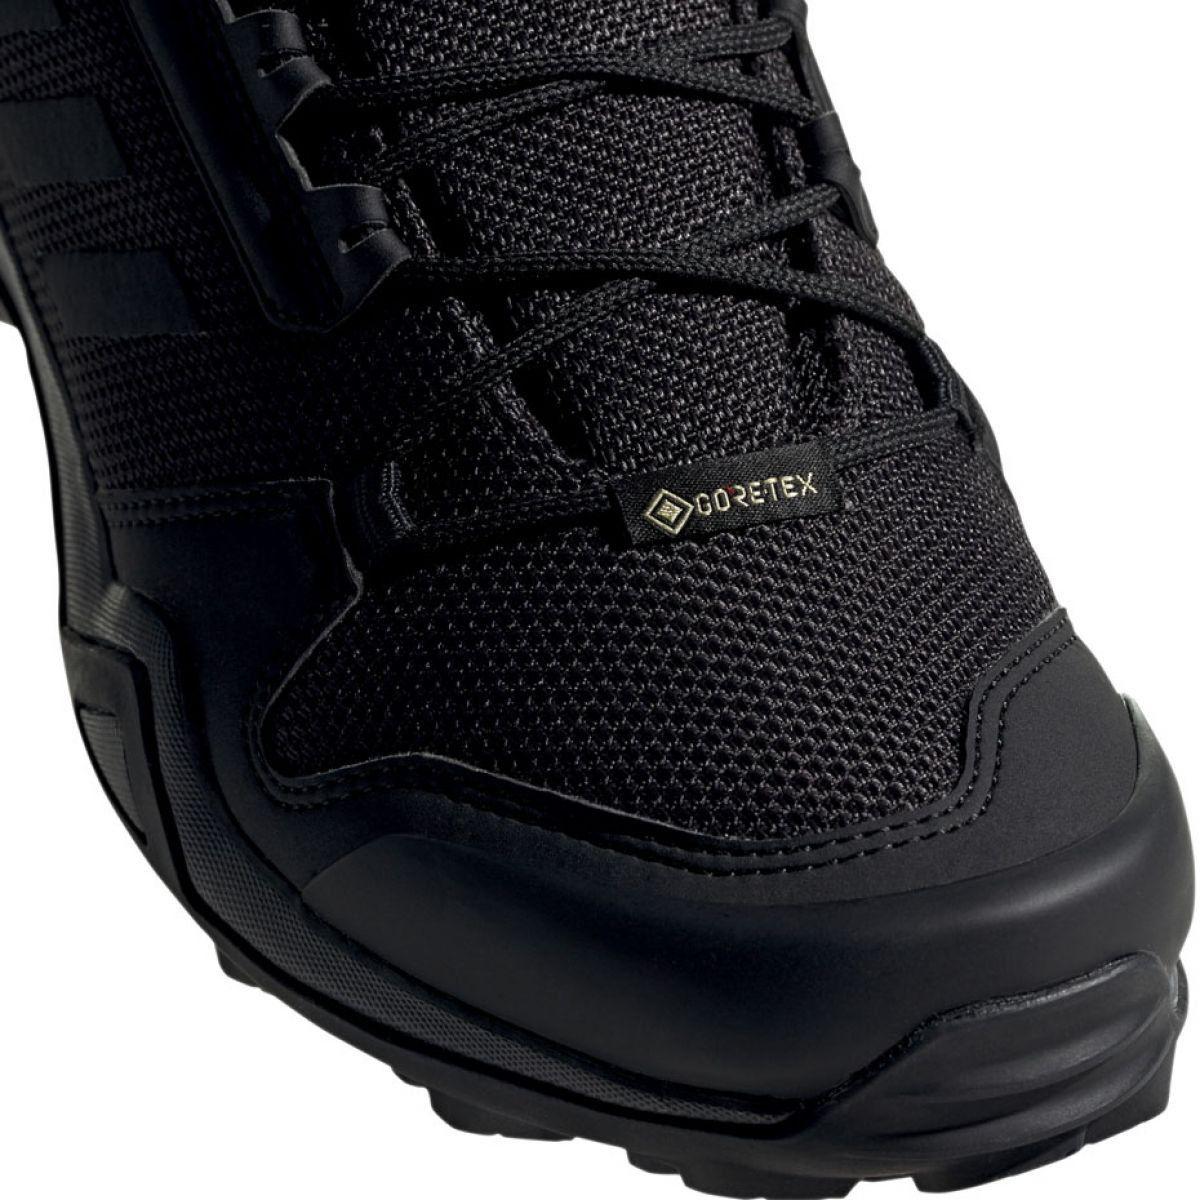 Buty Trekkingowe Adidas Terrex Ax3 Mid Gtx W Bc0590 Czarne Adidas Shoes Women Trekking Shoes Hiking Shoes